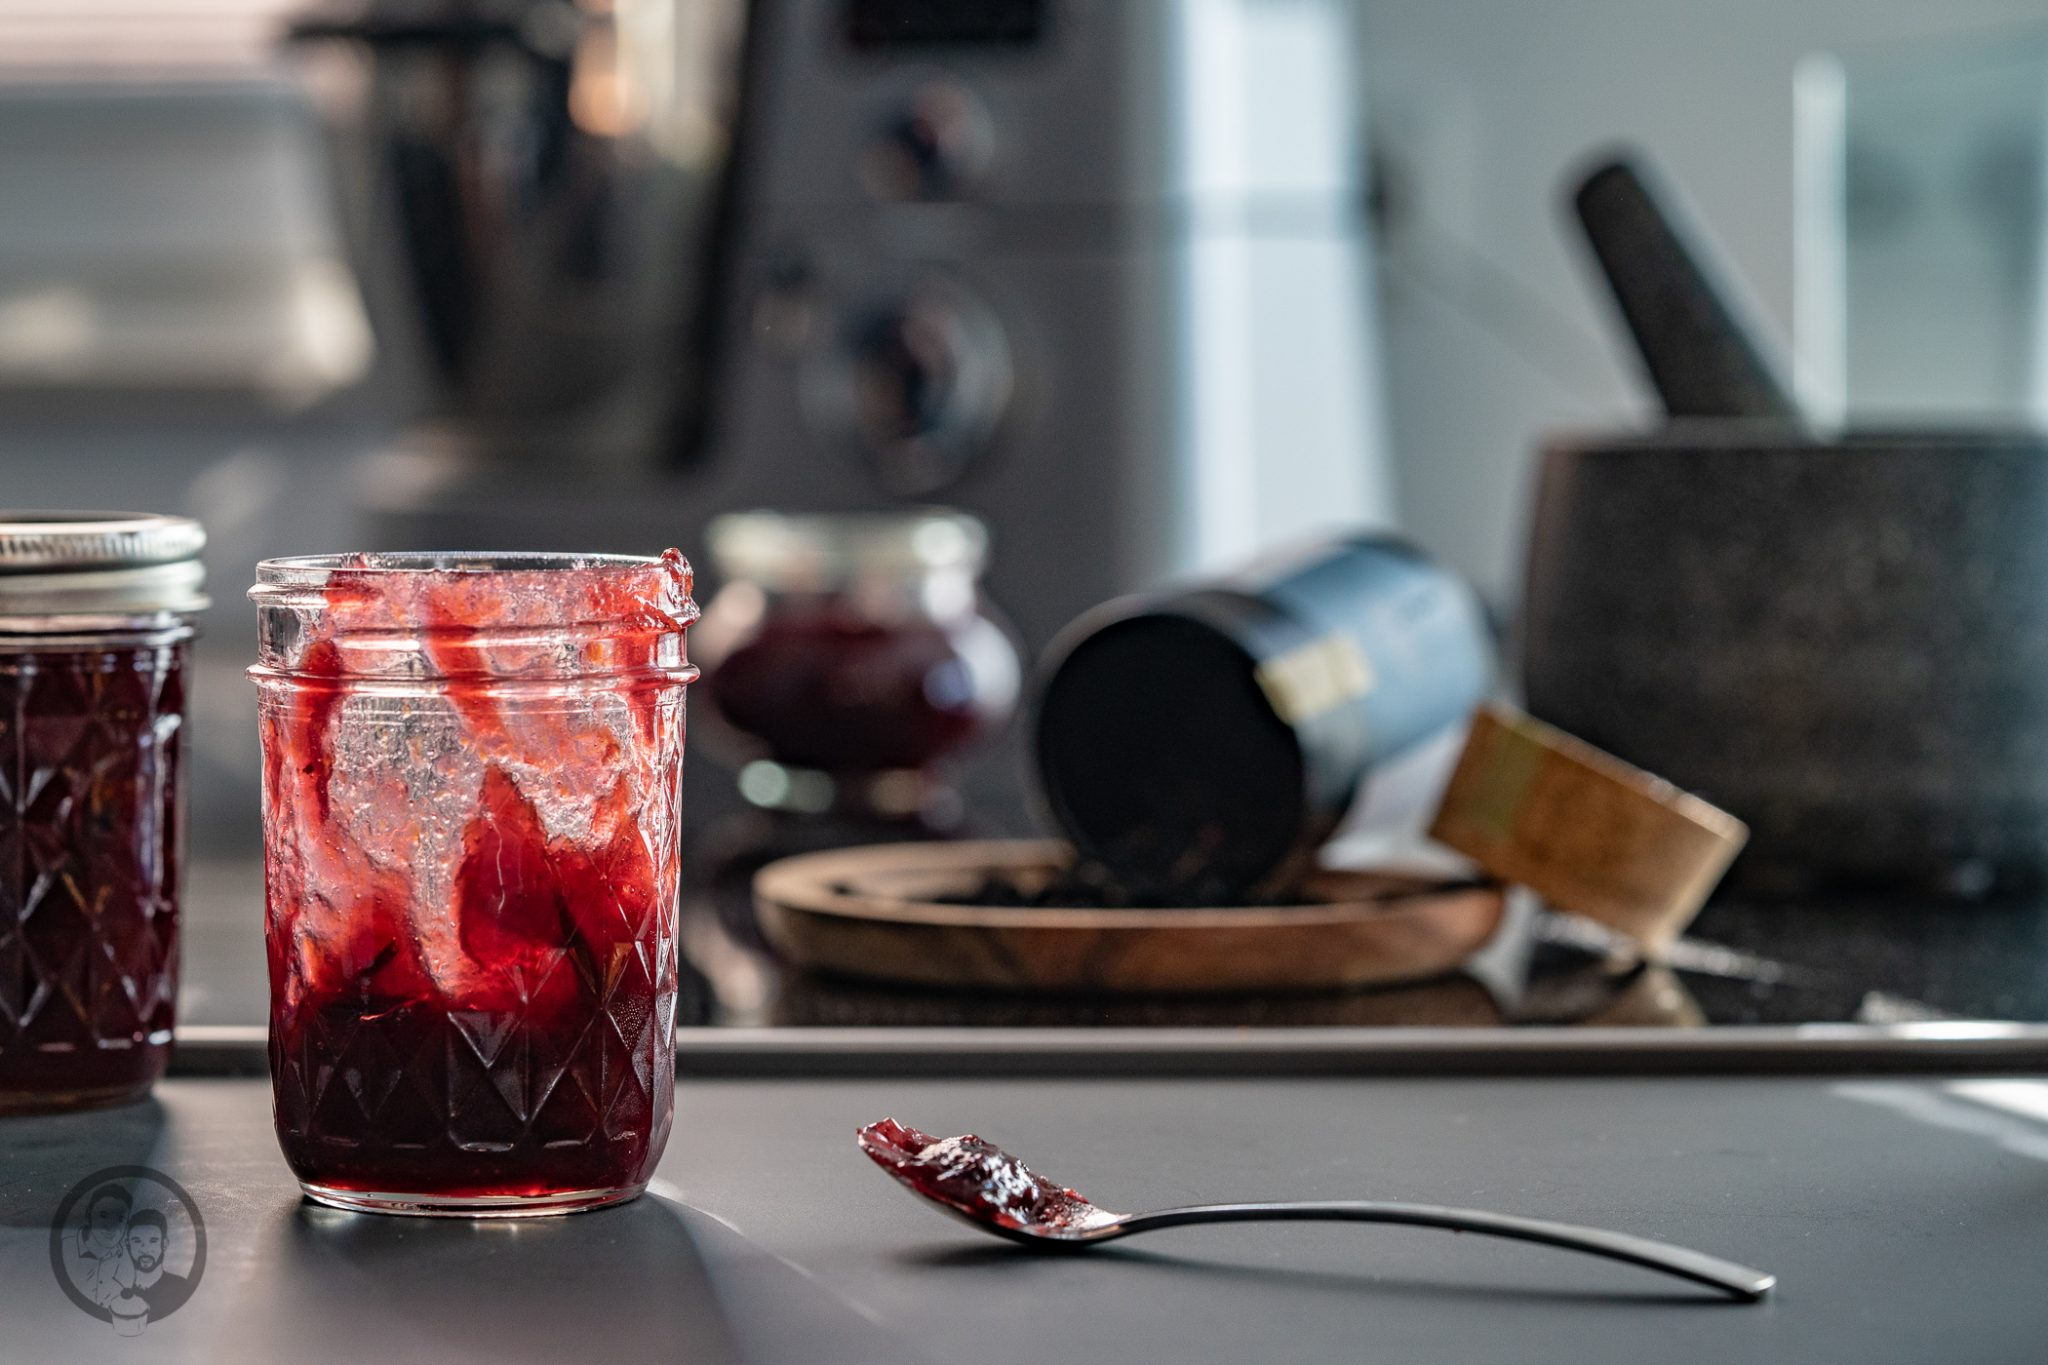 Pflaumenmarmelade im Glas